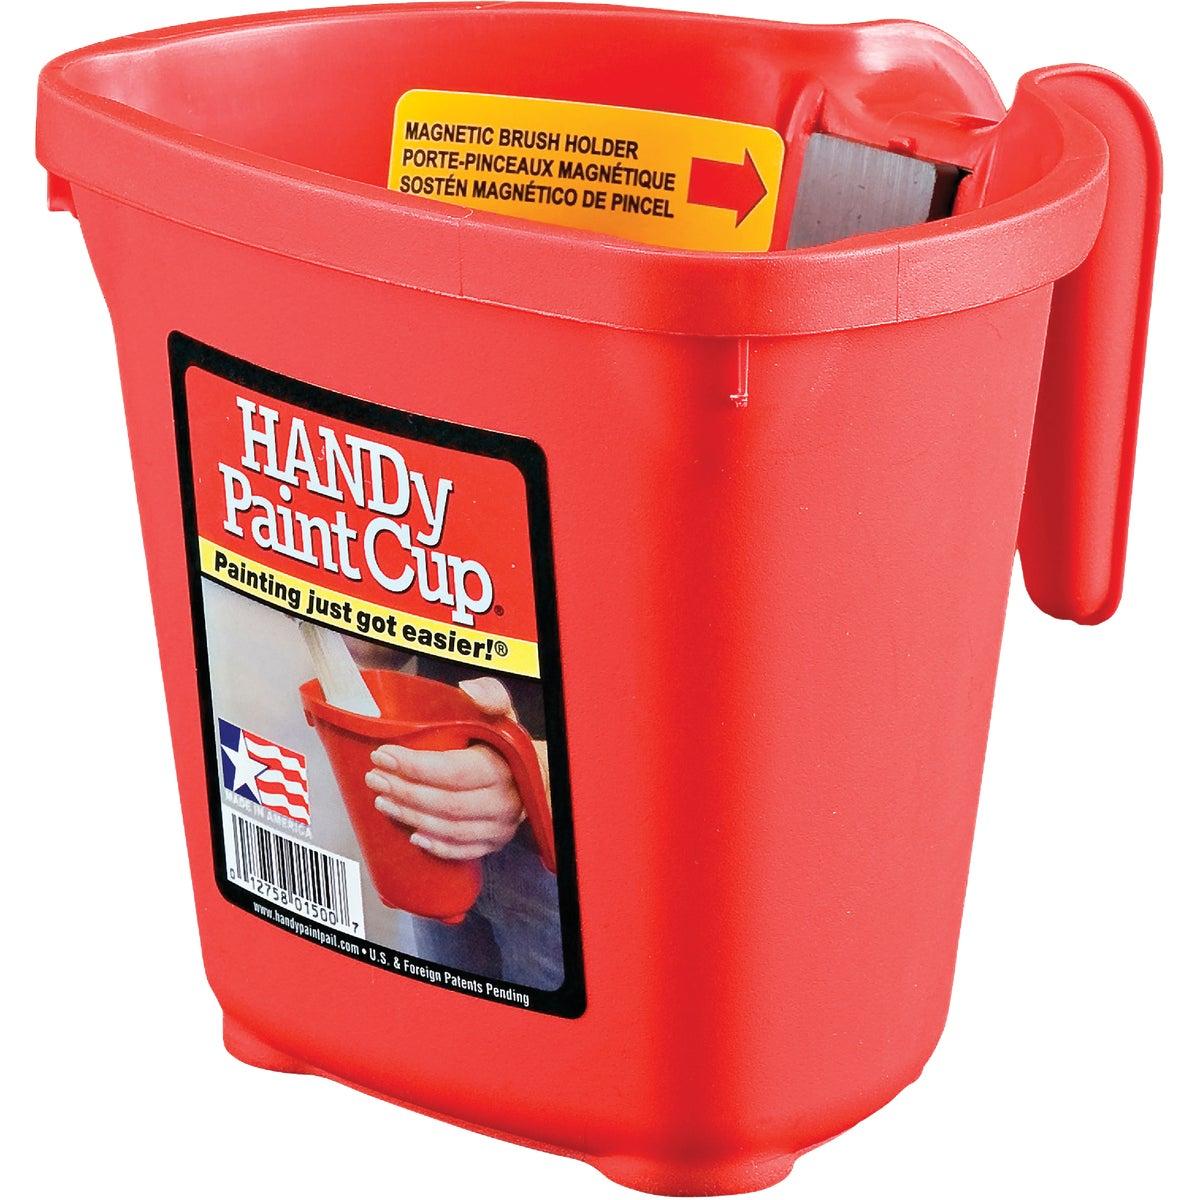 HANDY PAINT CUP